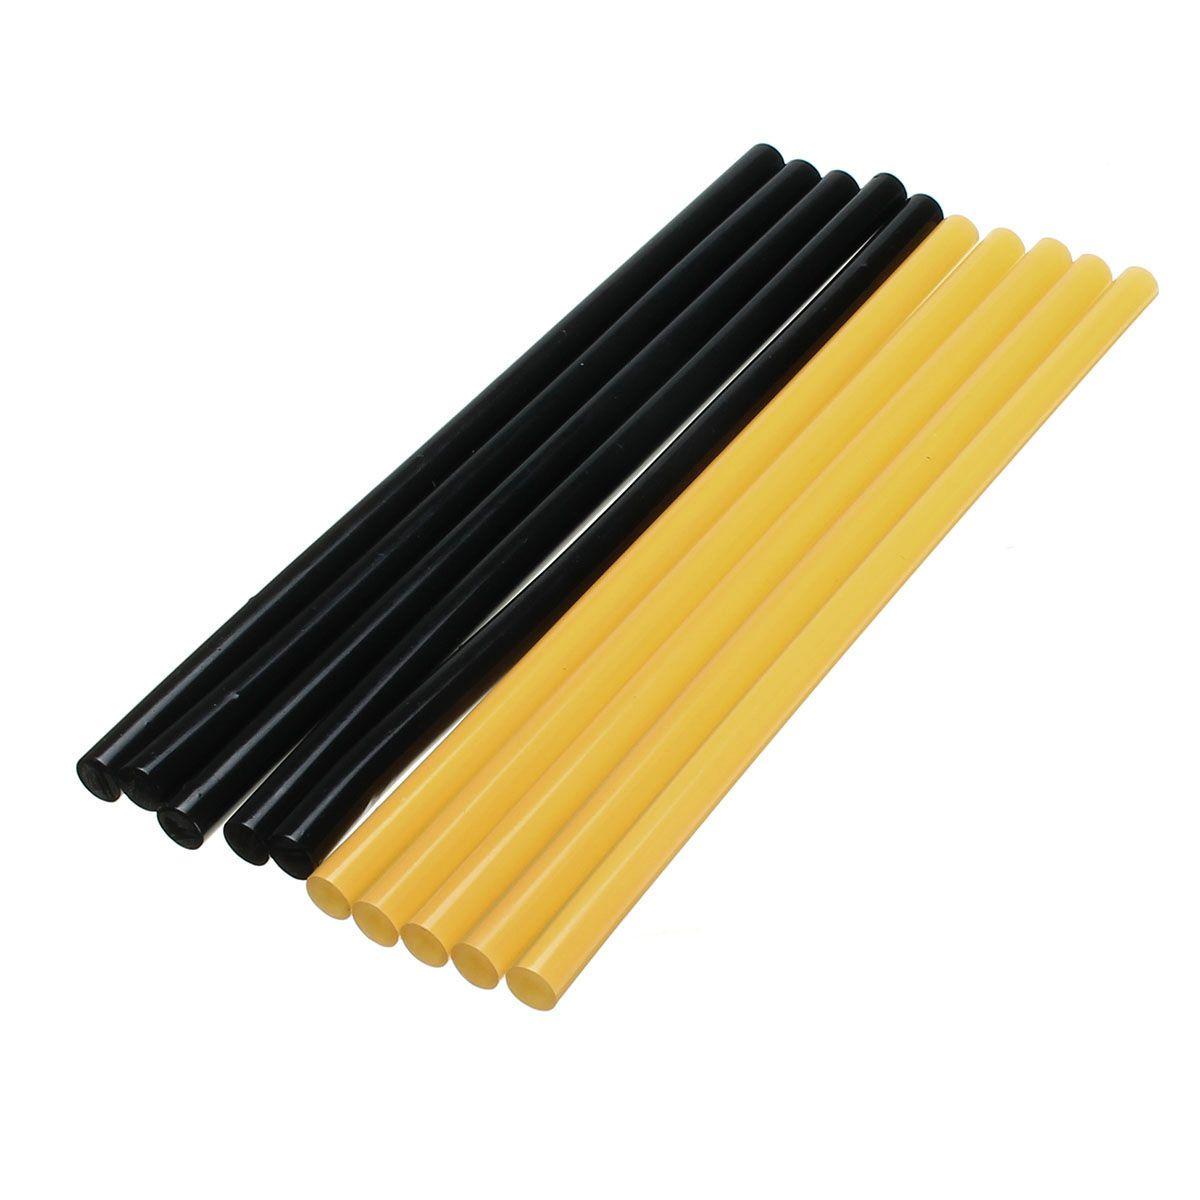 10pcs Gliston Calientes Barras De Pegamento De Reparaci N De  ~ Herramientas Pintor Profesional